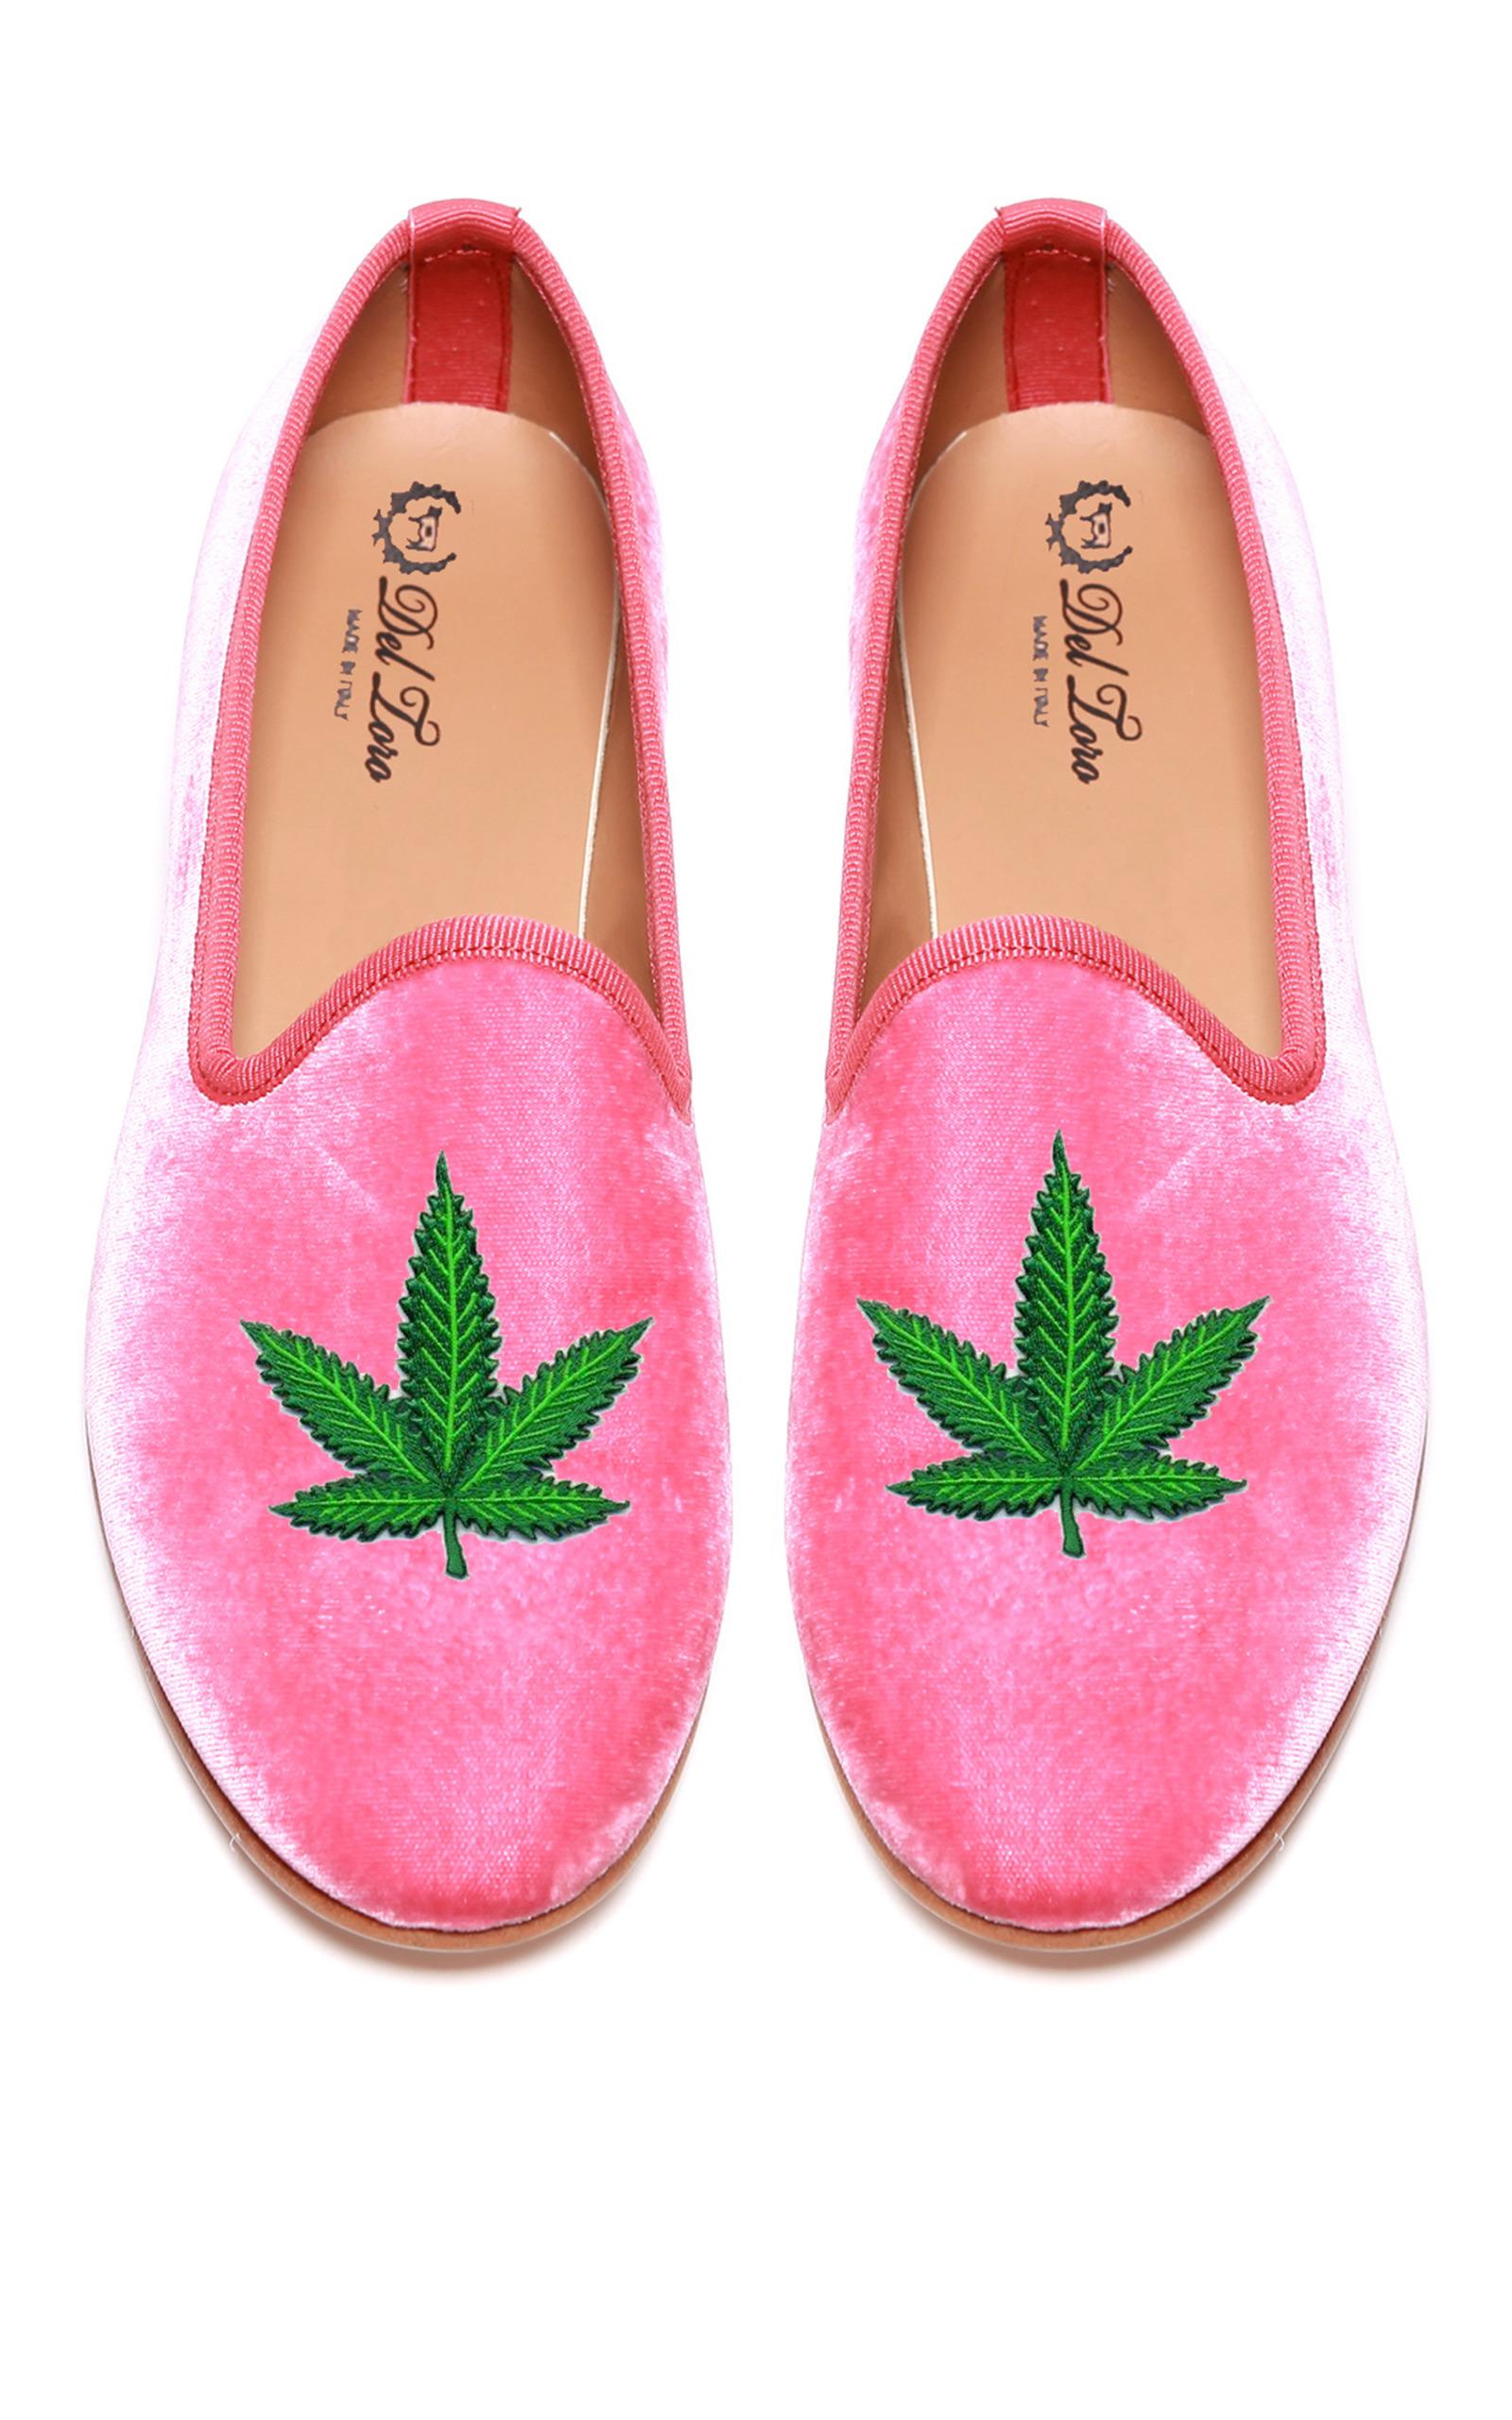 e1232dec203 Del ToroPrince Albert Bubblegum Pink Velvet Slipper Loafers With Cannabis  Leaf